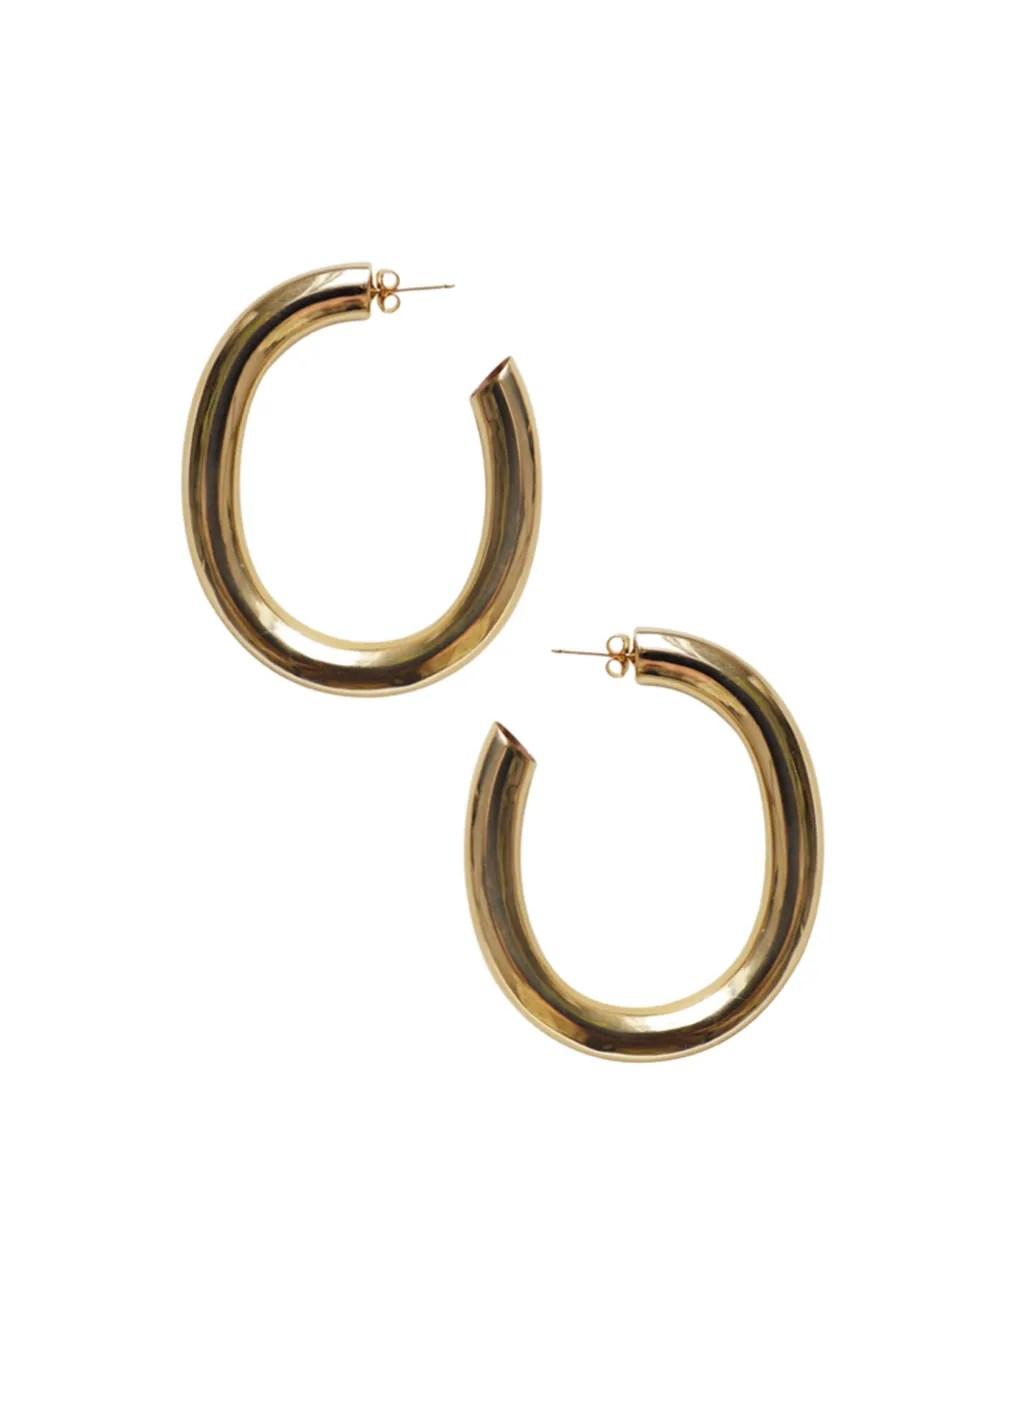 Nike earrings haveta get Nike t Jewerly Jewelery and